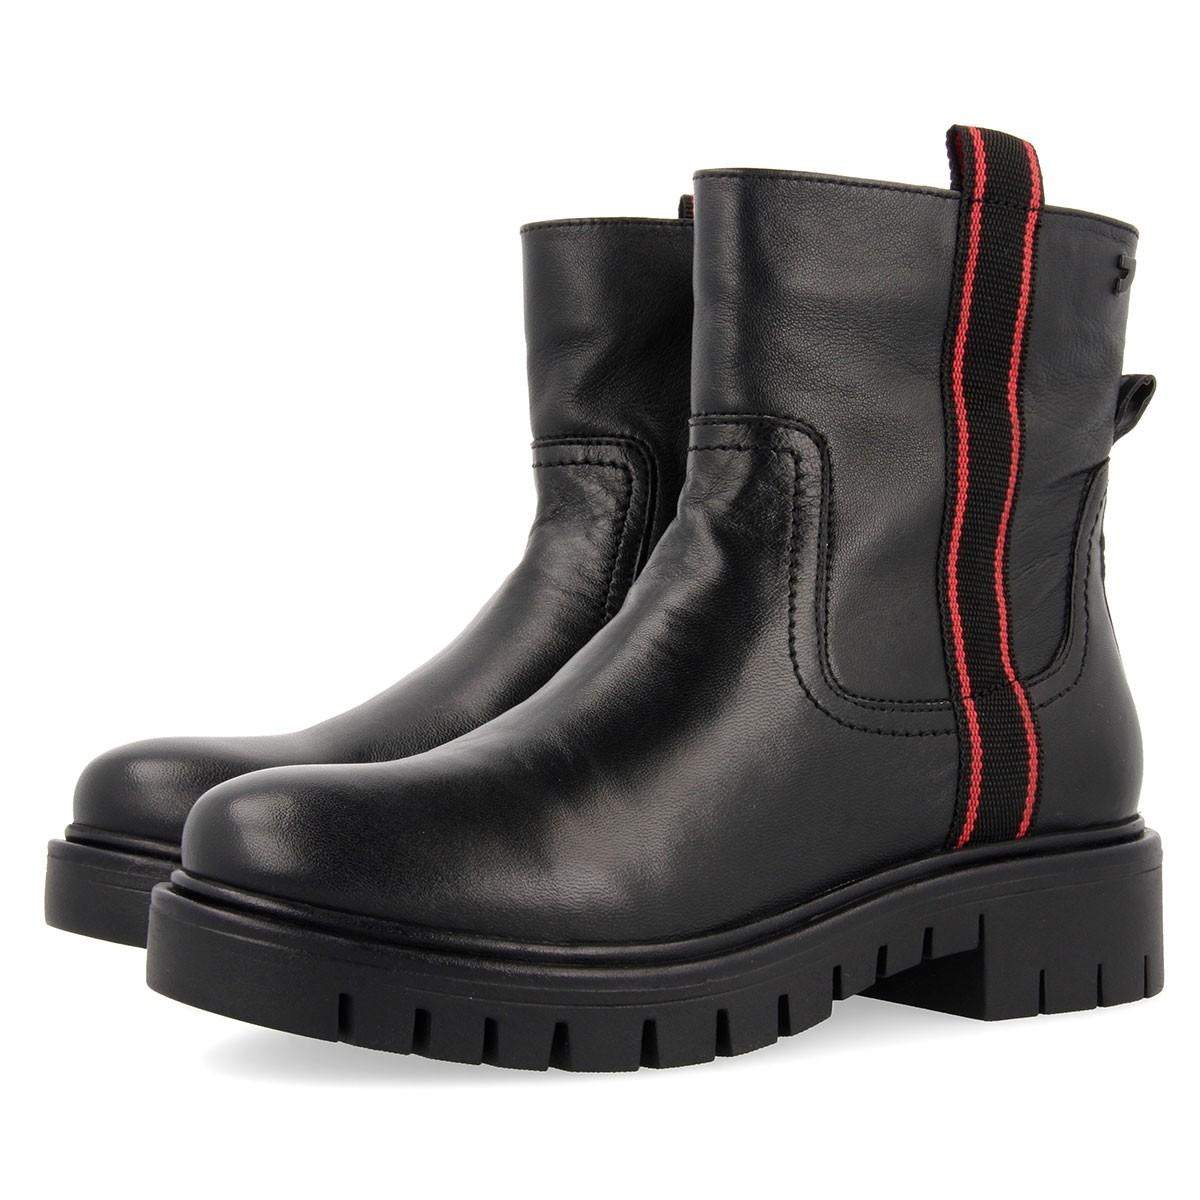 56554 Black BOOTS 3